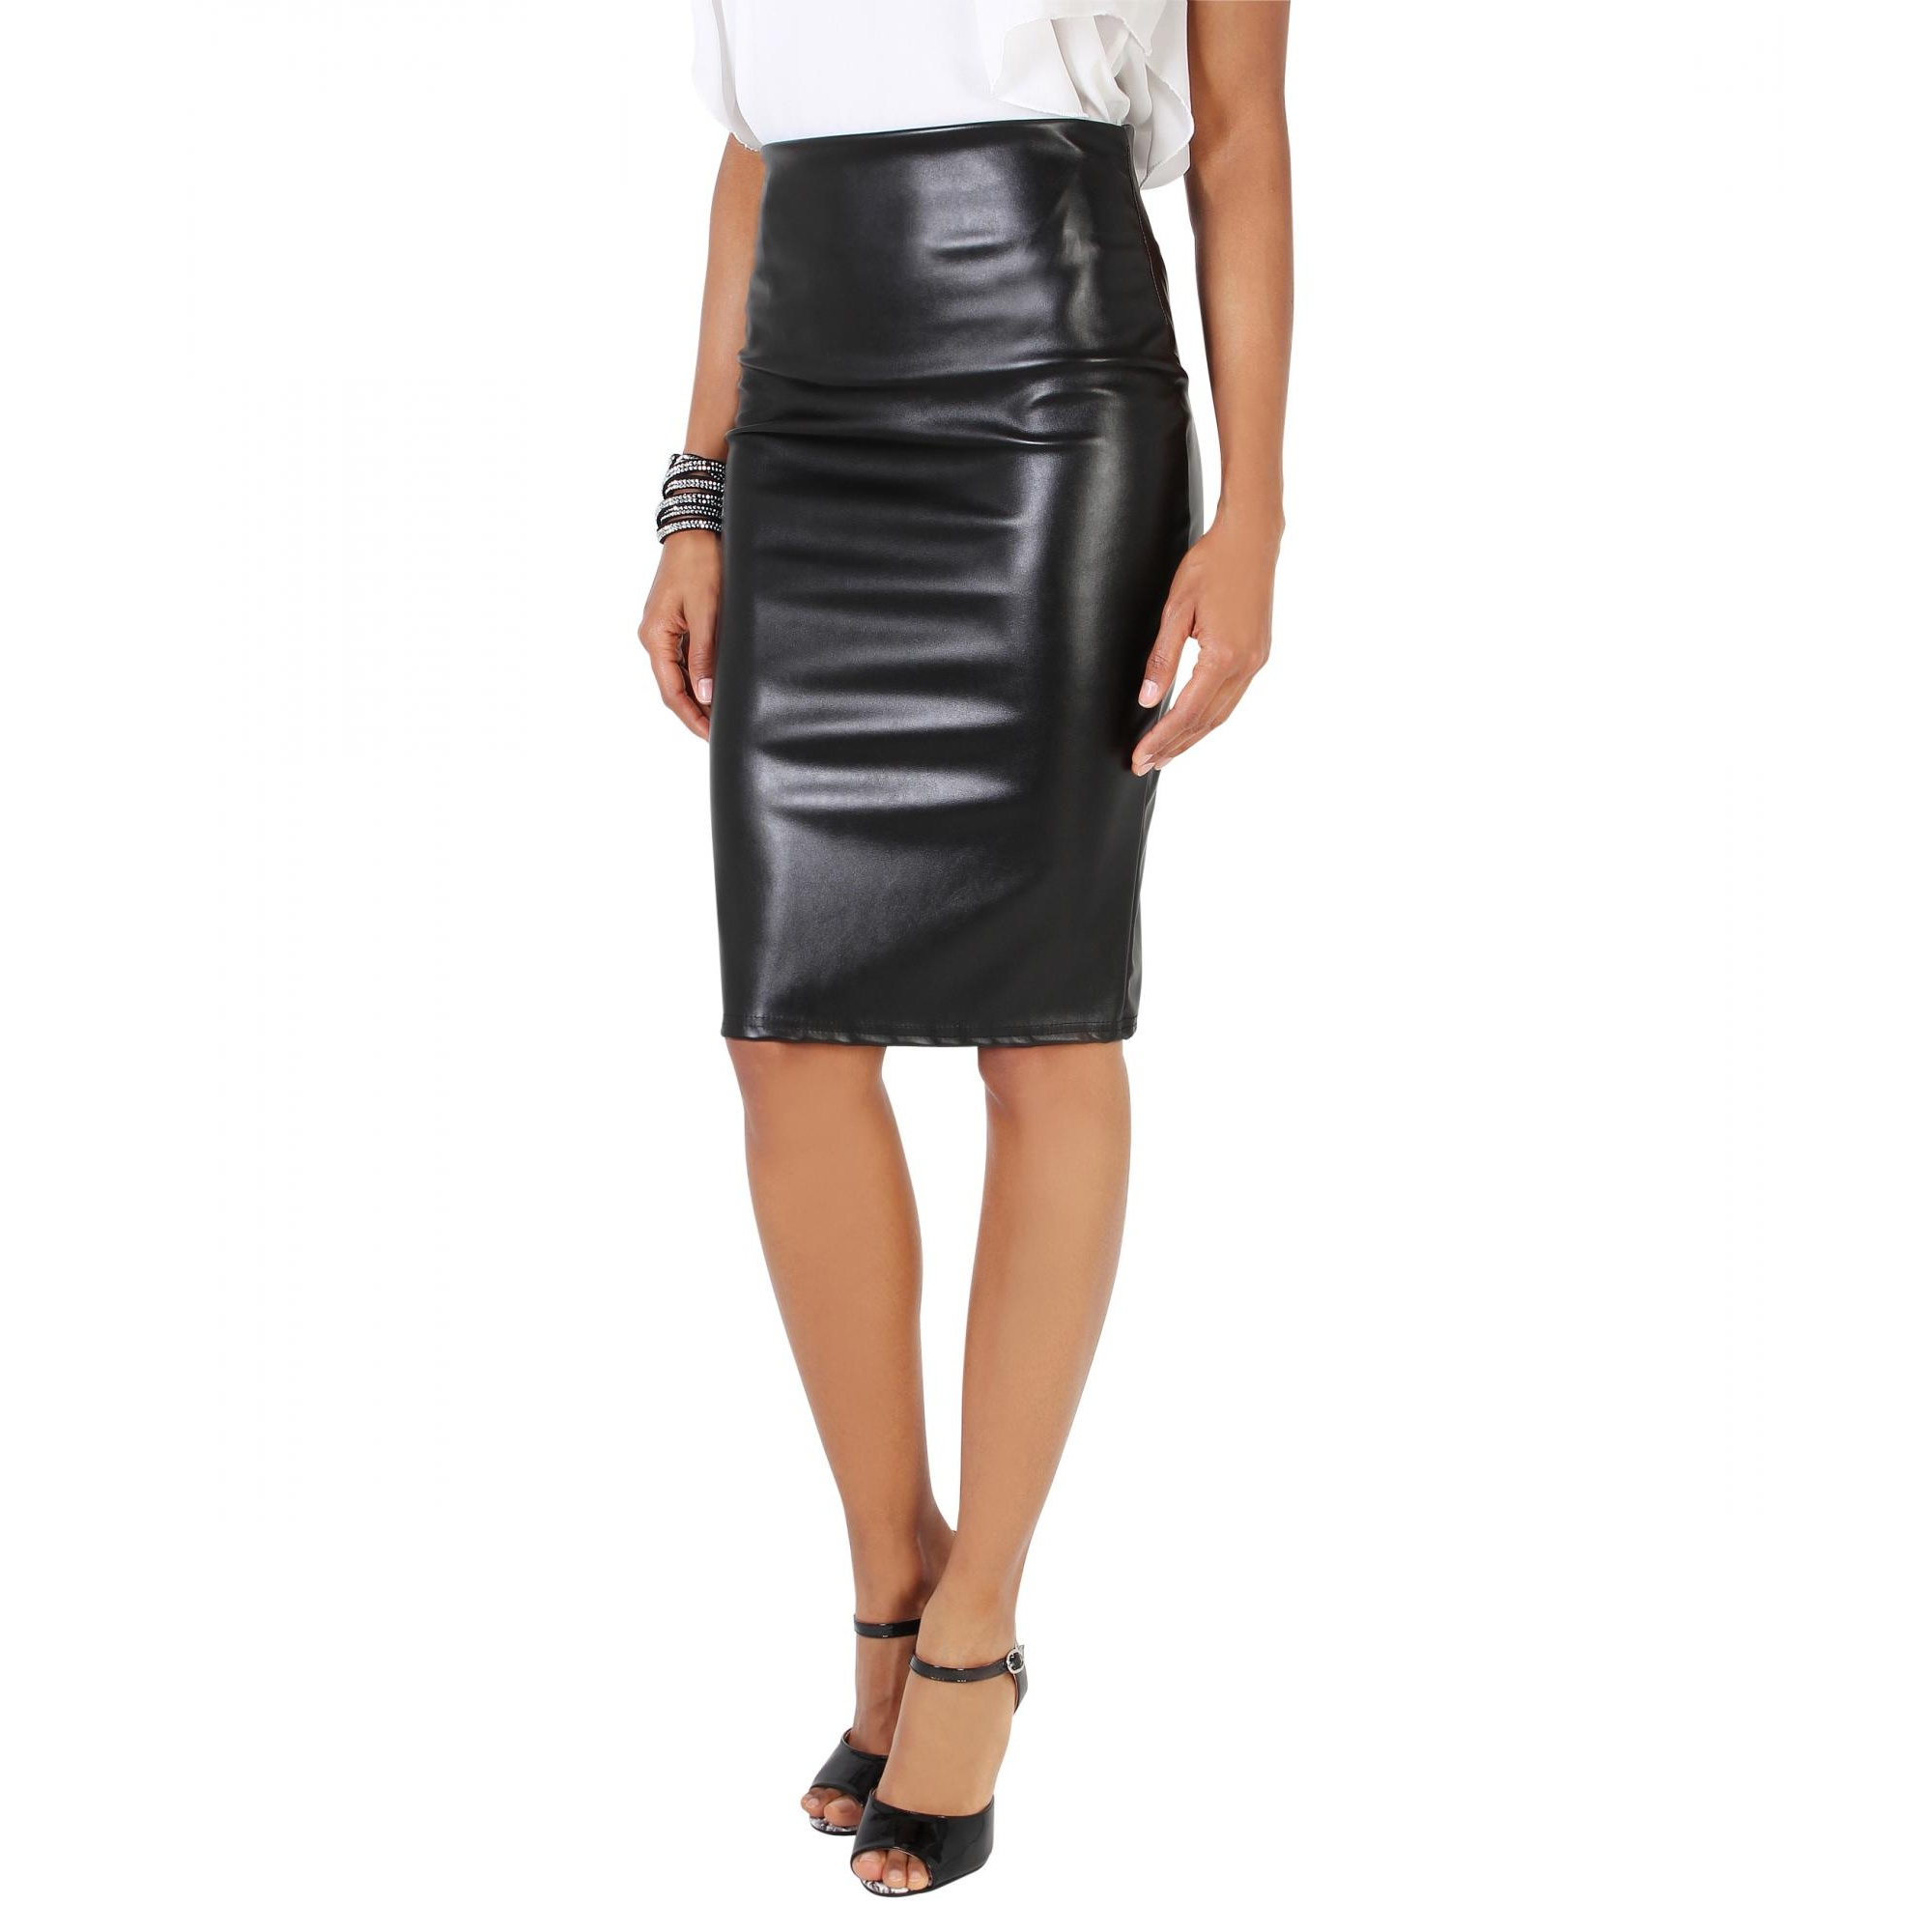 Krisp Womens/Ladies High Waist PU Pencil Skirt (12 UK) (Black)